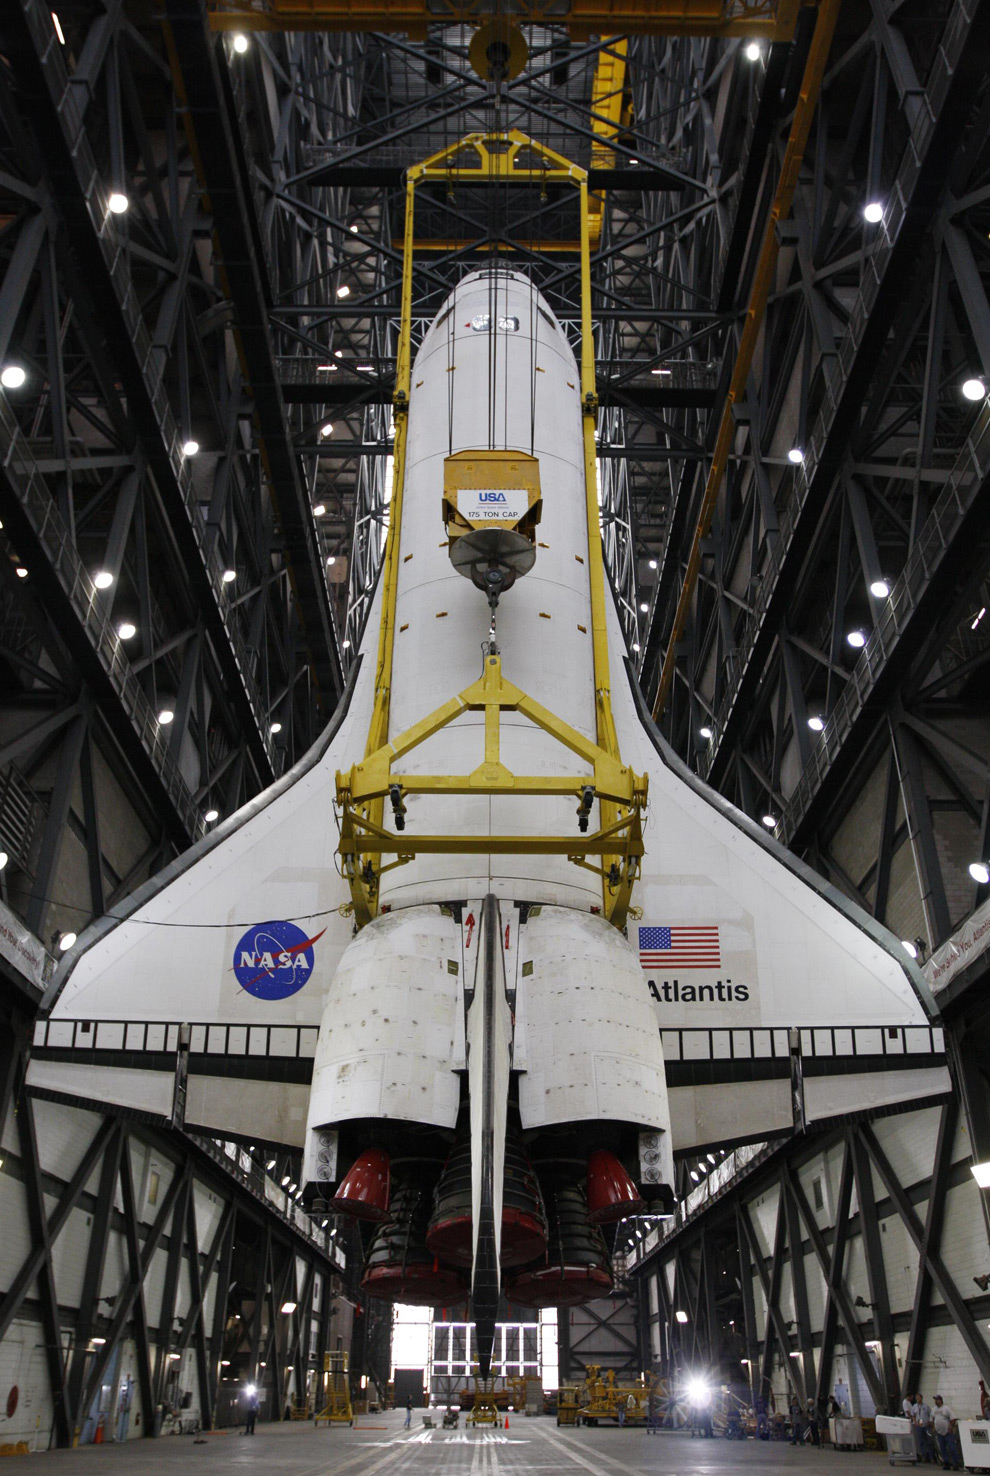 government space shuttle program - photo #24